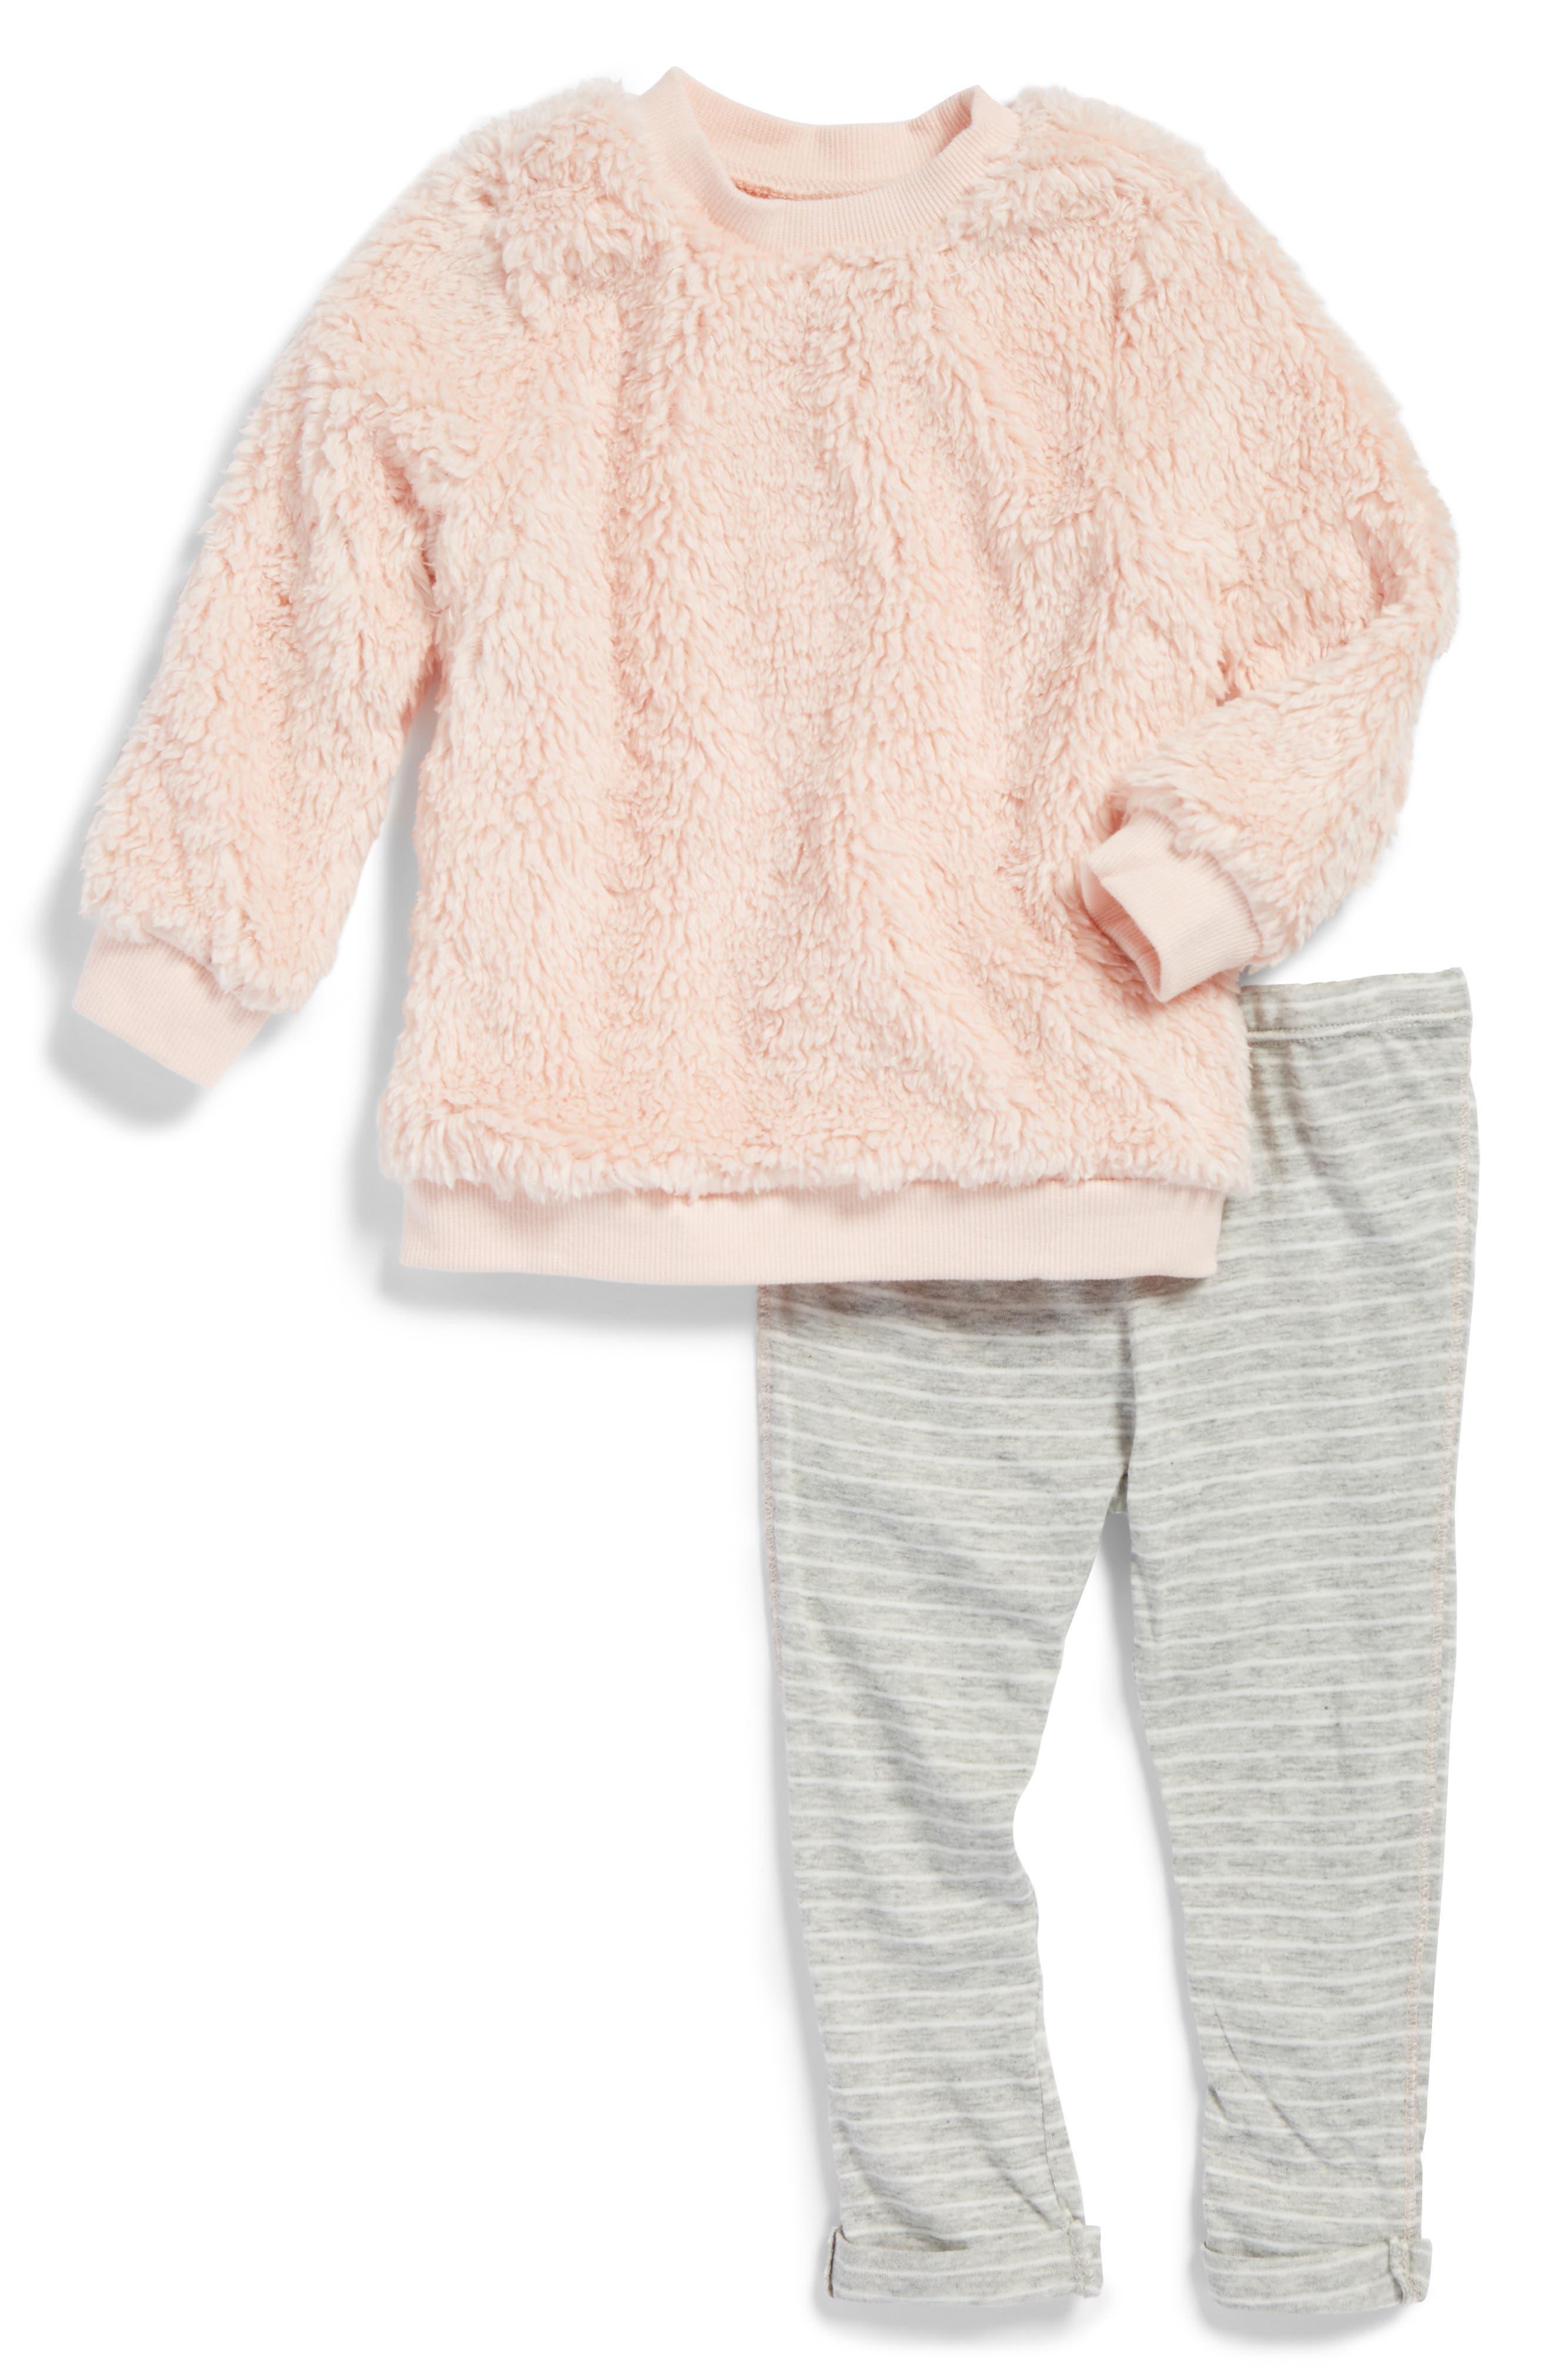 Alternate Image 1 Selected - Splendid High-Pile Fleece Pullover Sweatshirt & Leggings Set (Baby Girls)